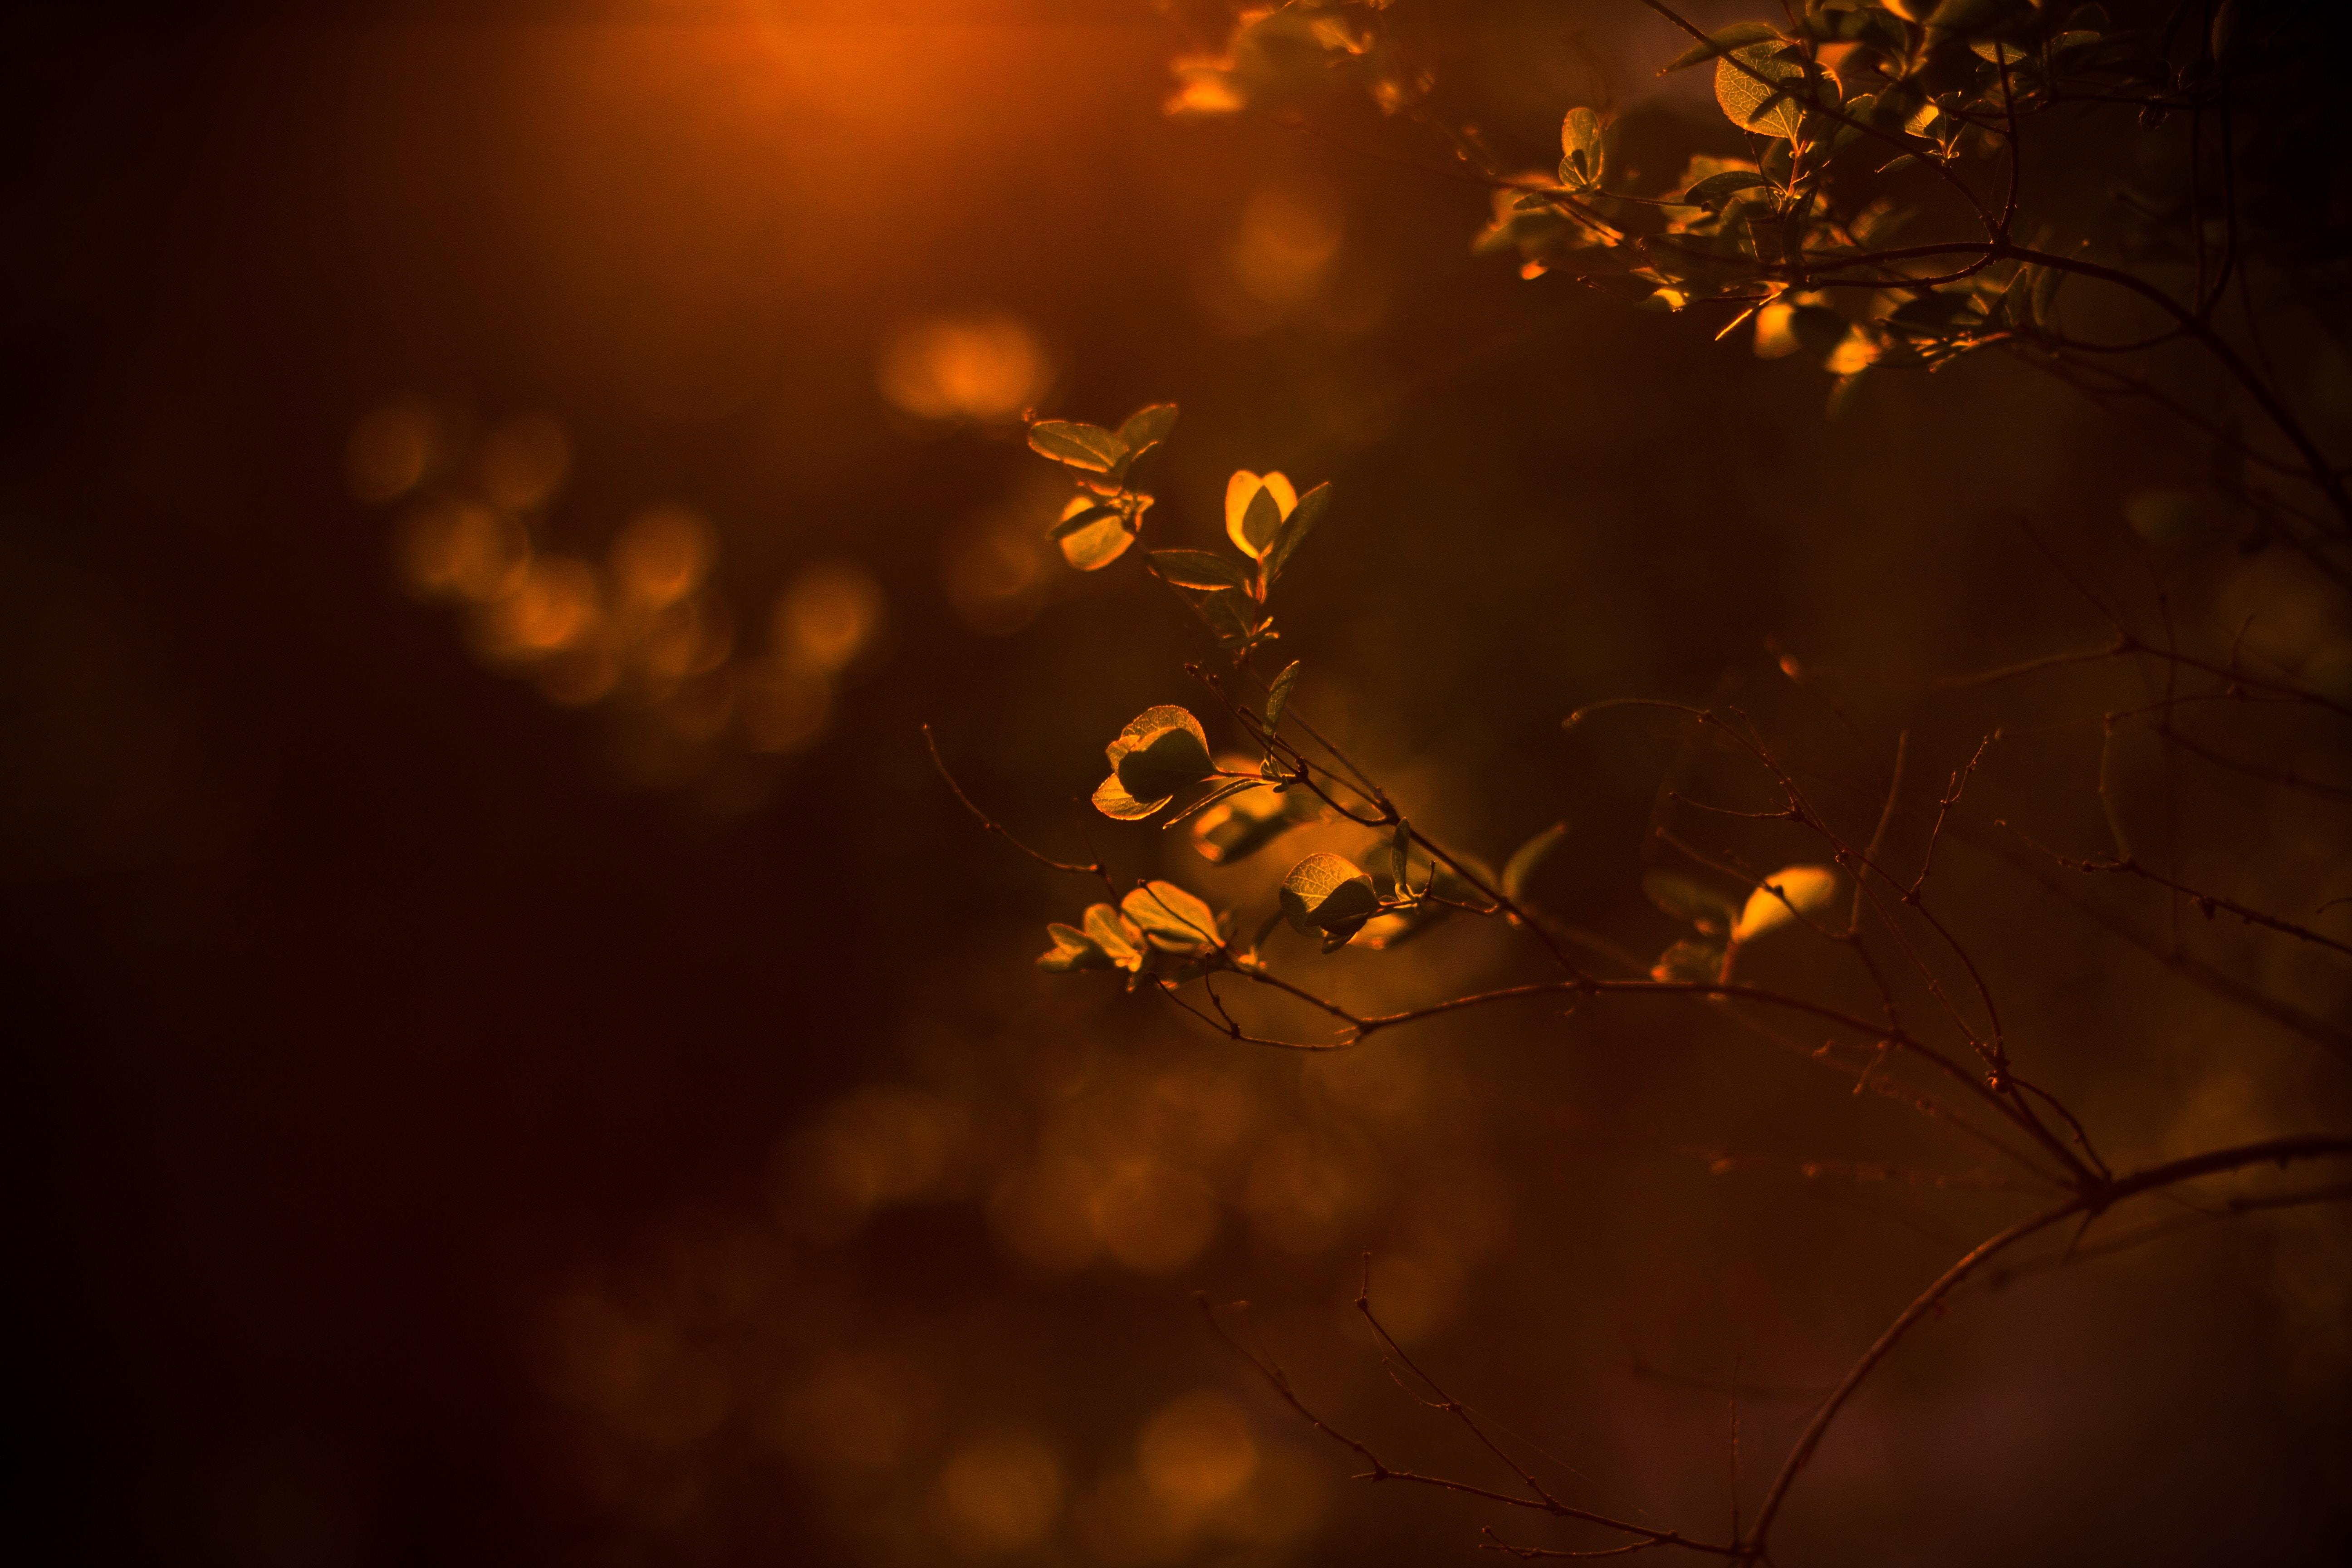 tilt shift lens photography of brown plant